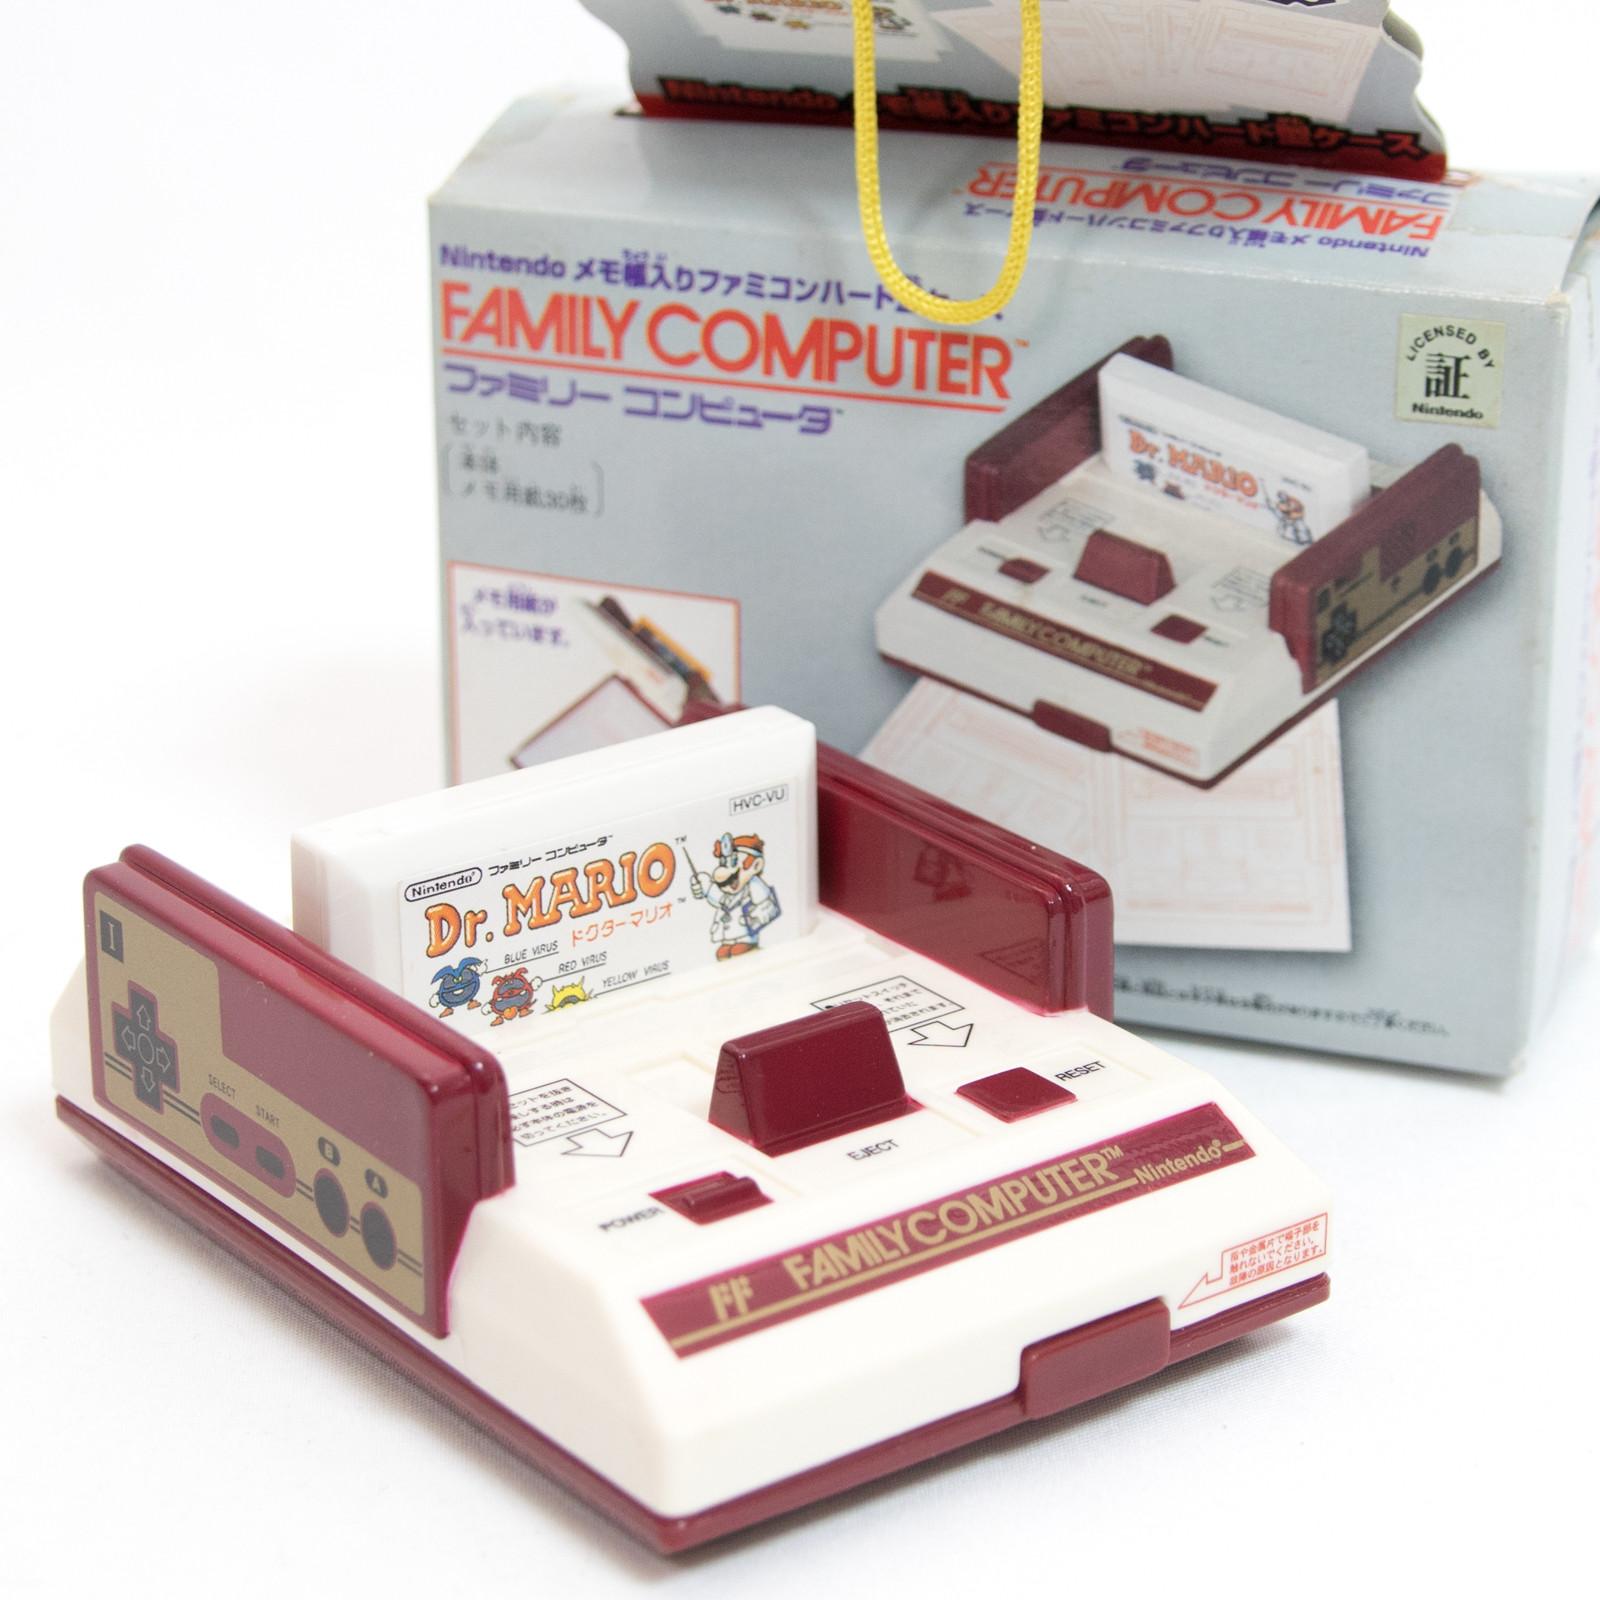 Dr. Mario Nintendo NES Famicom Family Computer Type Memo Paper Case JAPAN